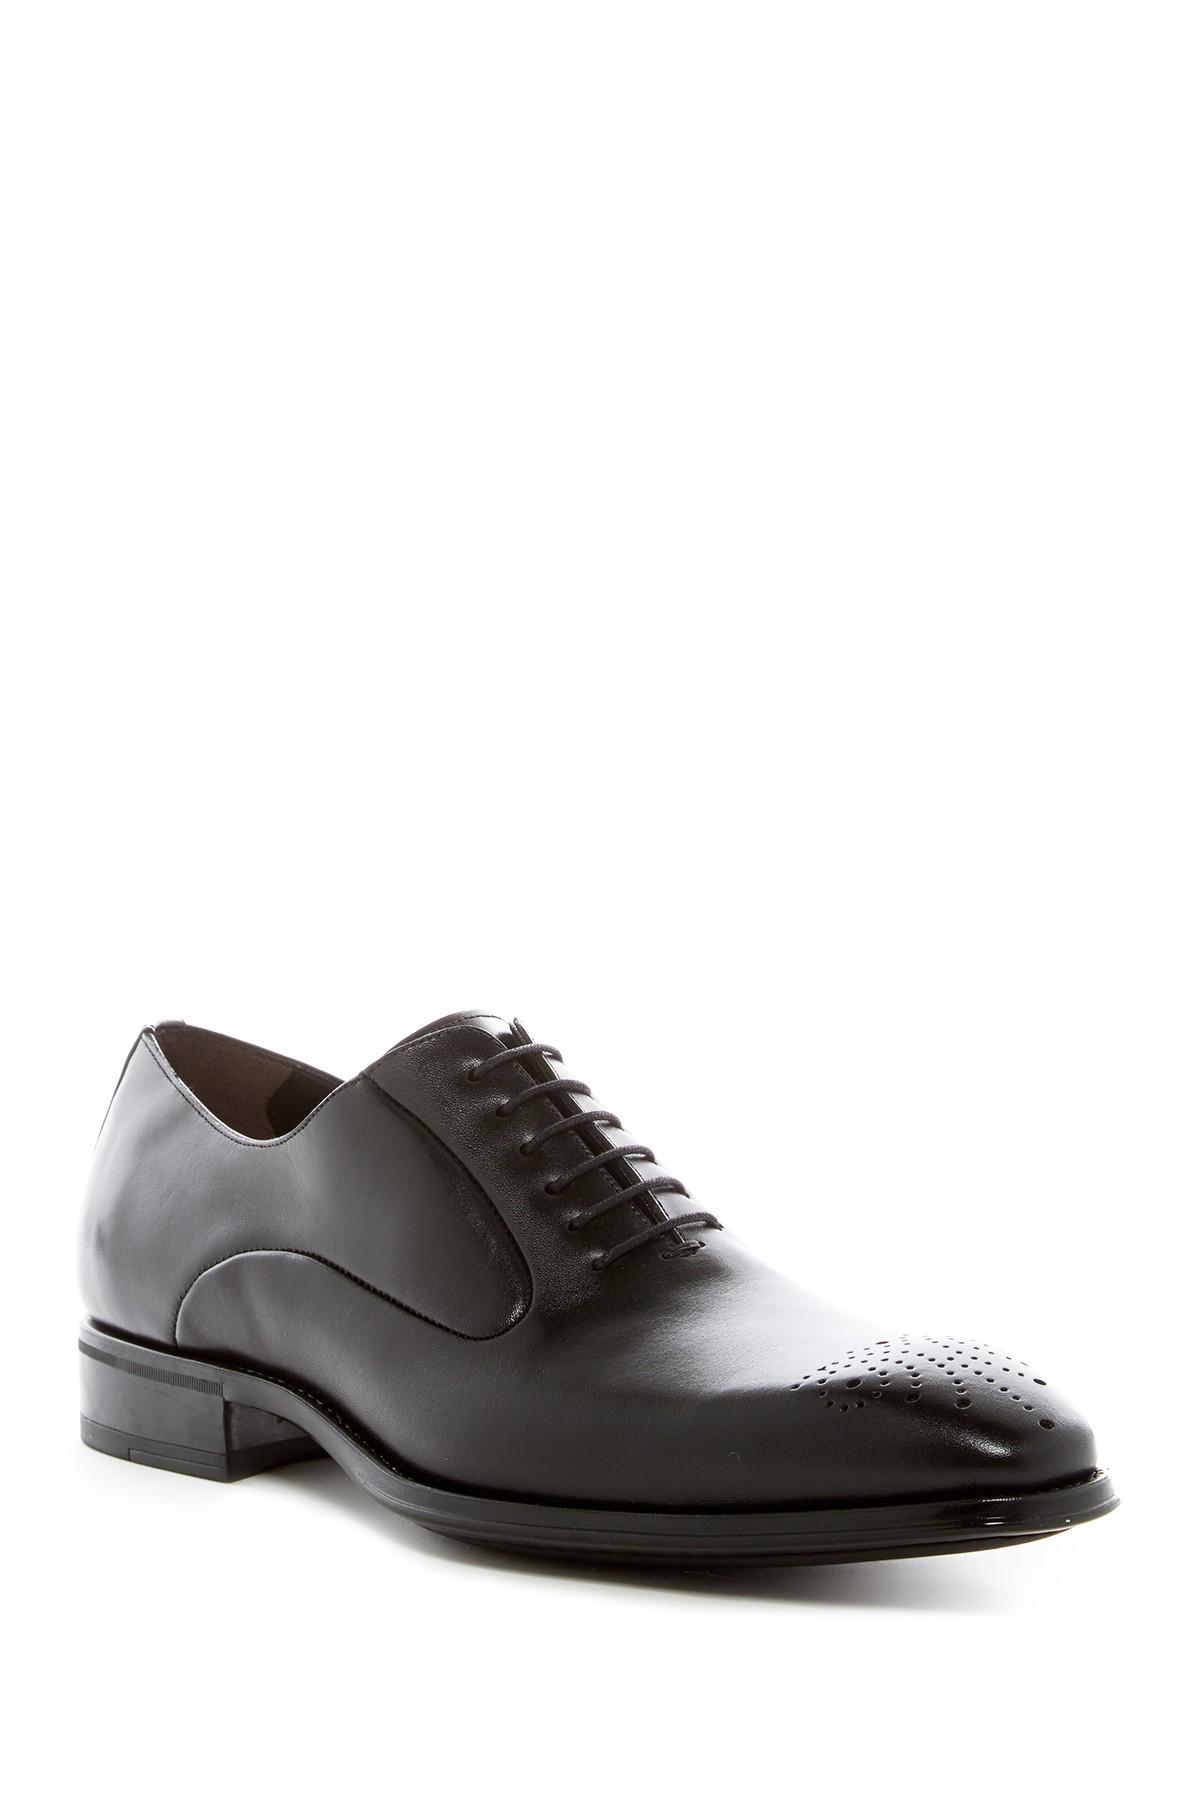 Mezlan Dress Shoes On Sale